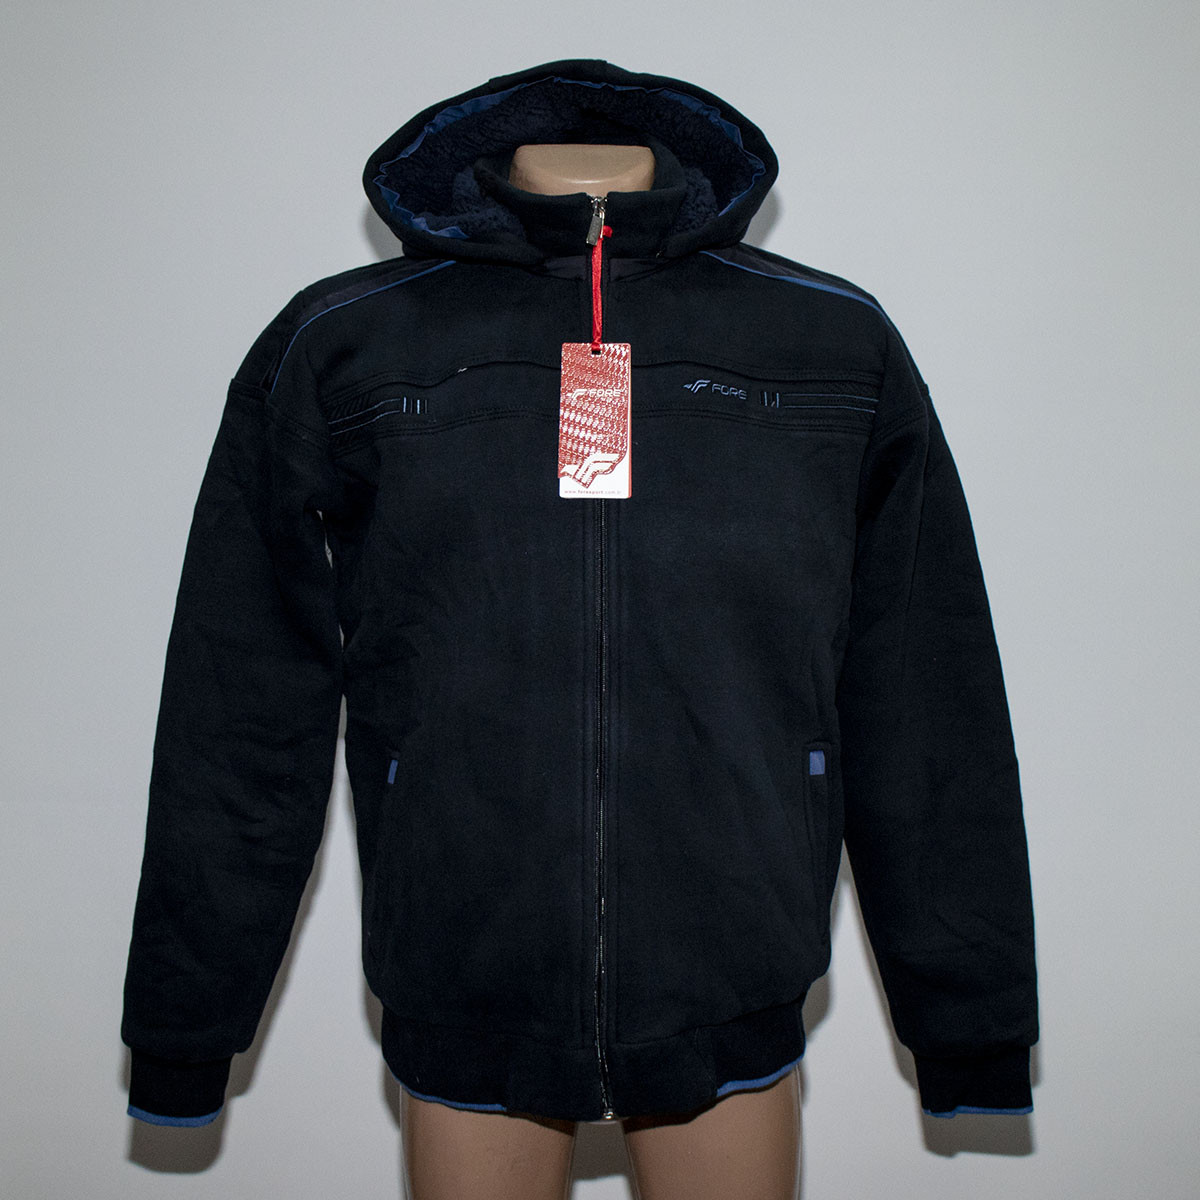 Теплая мужская куртка трехнитка на овчинке пр-во Турция т.м. Fore 5342